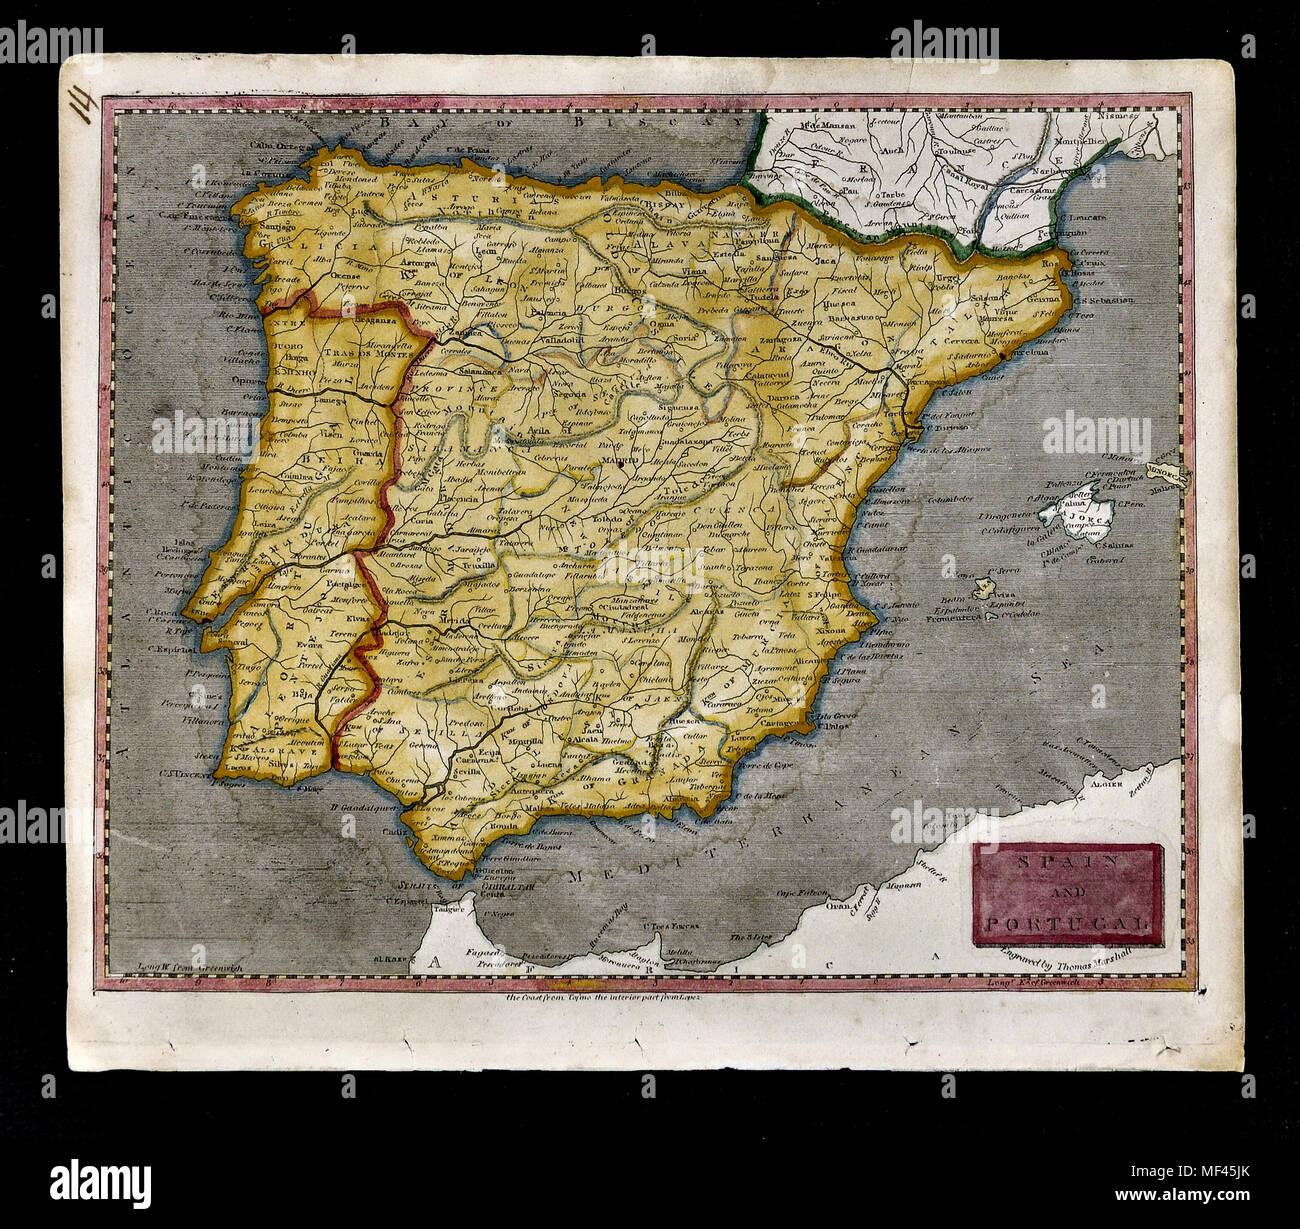 1804 Arrowsmith Mapa Espana Y Portugal Lisboa Braga Porto